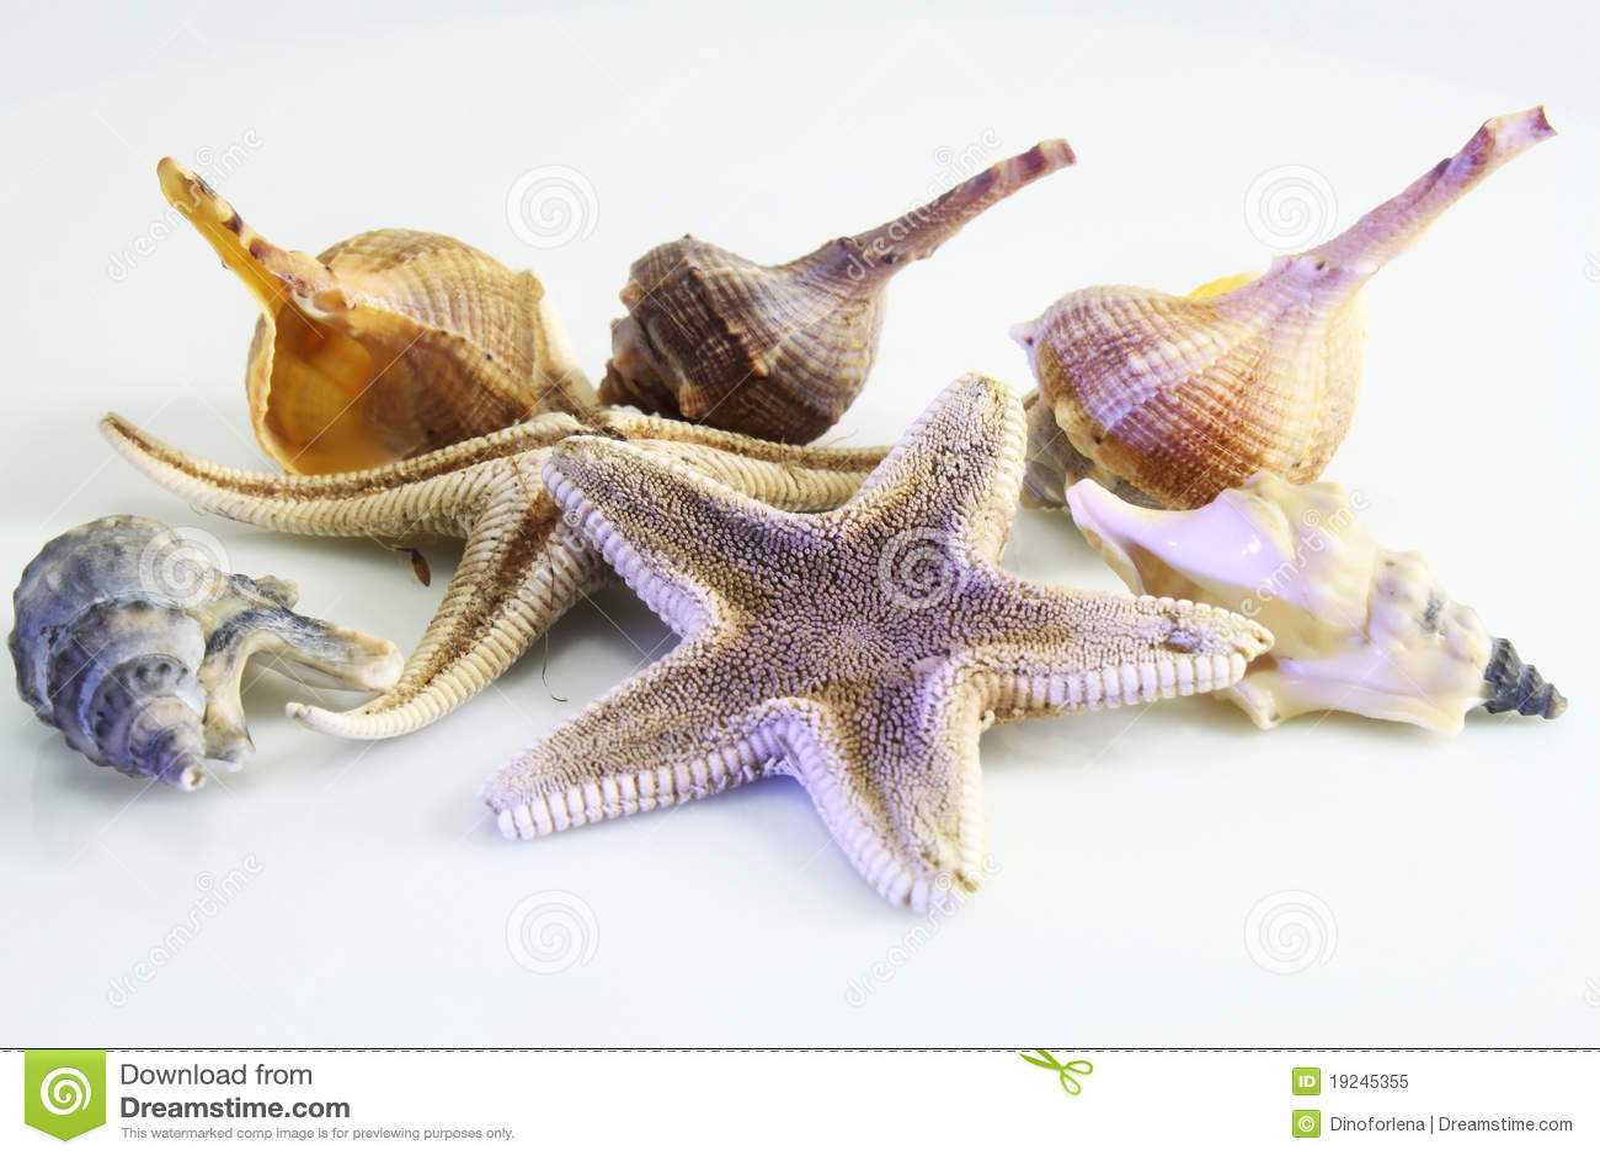 Starfish seashells